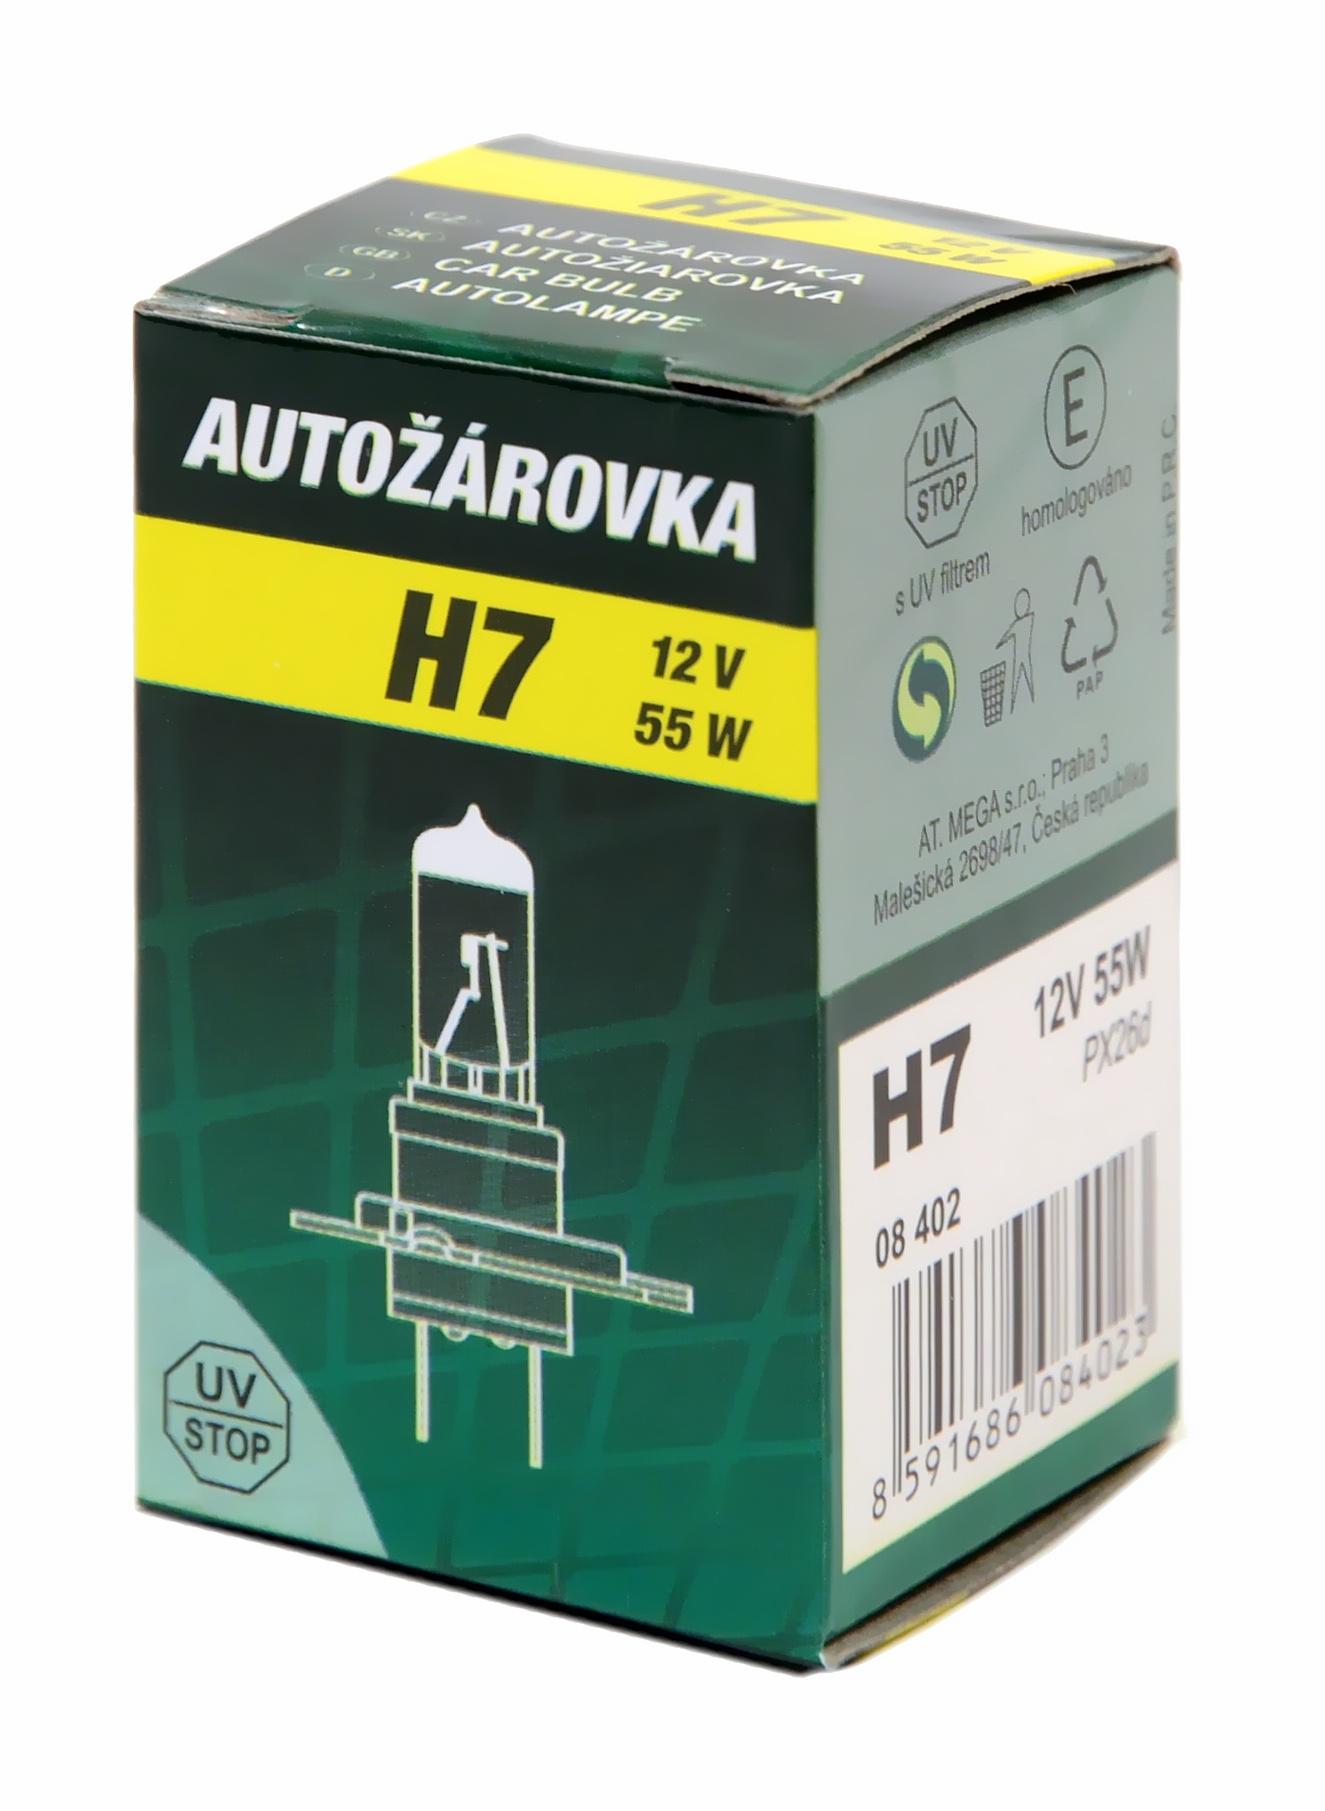 Žárovka H7 12V/55W, 08402